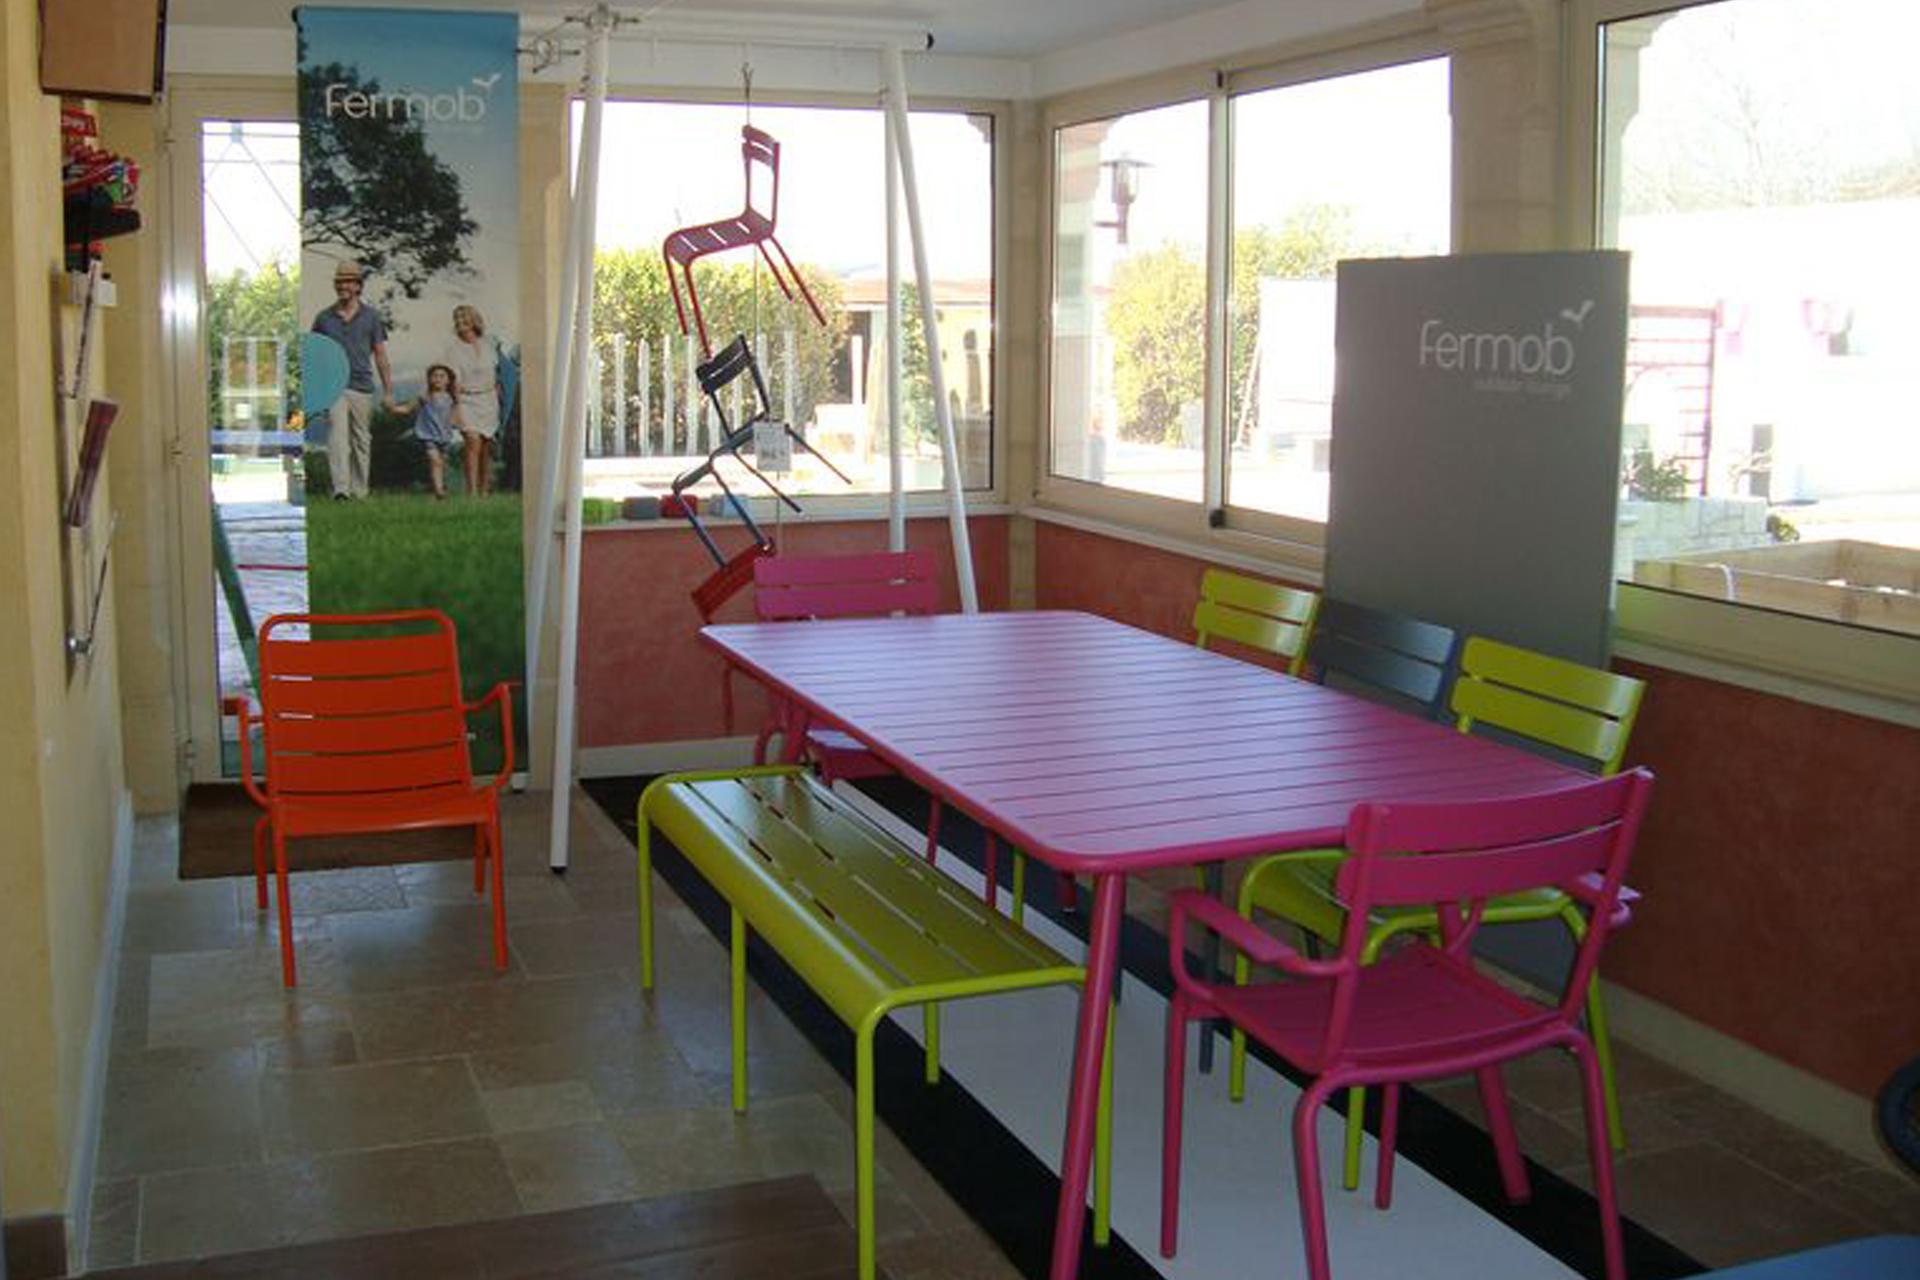 Salon De Jardin Aluminium Soldes - The Best Undercut Ponytail dedans Table De Jardin Aluminium Jardiland